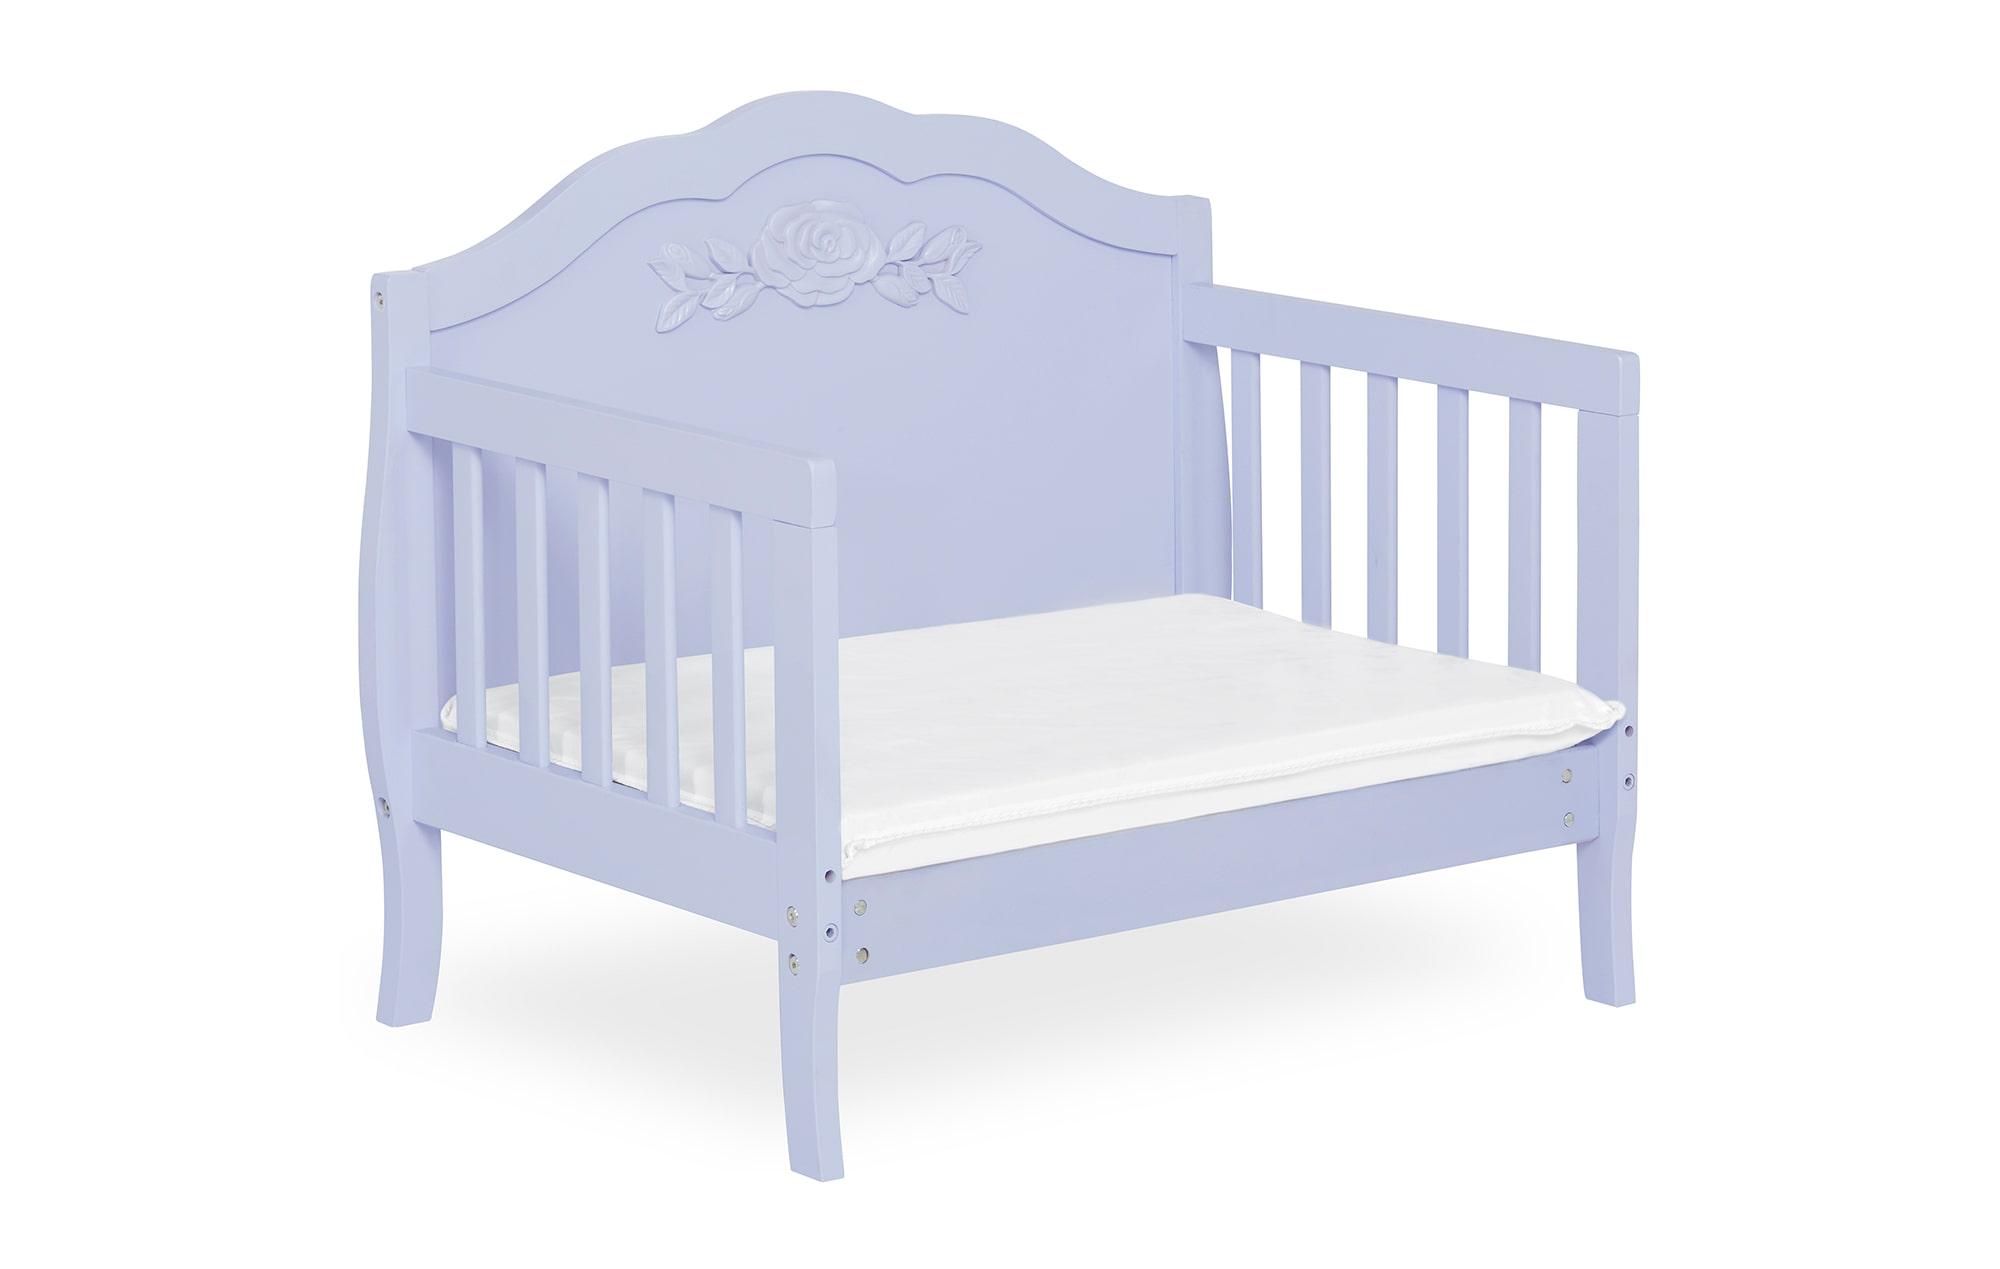 640_LAVD Rose Toddler Bed Silo 8